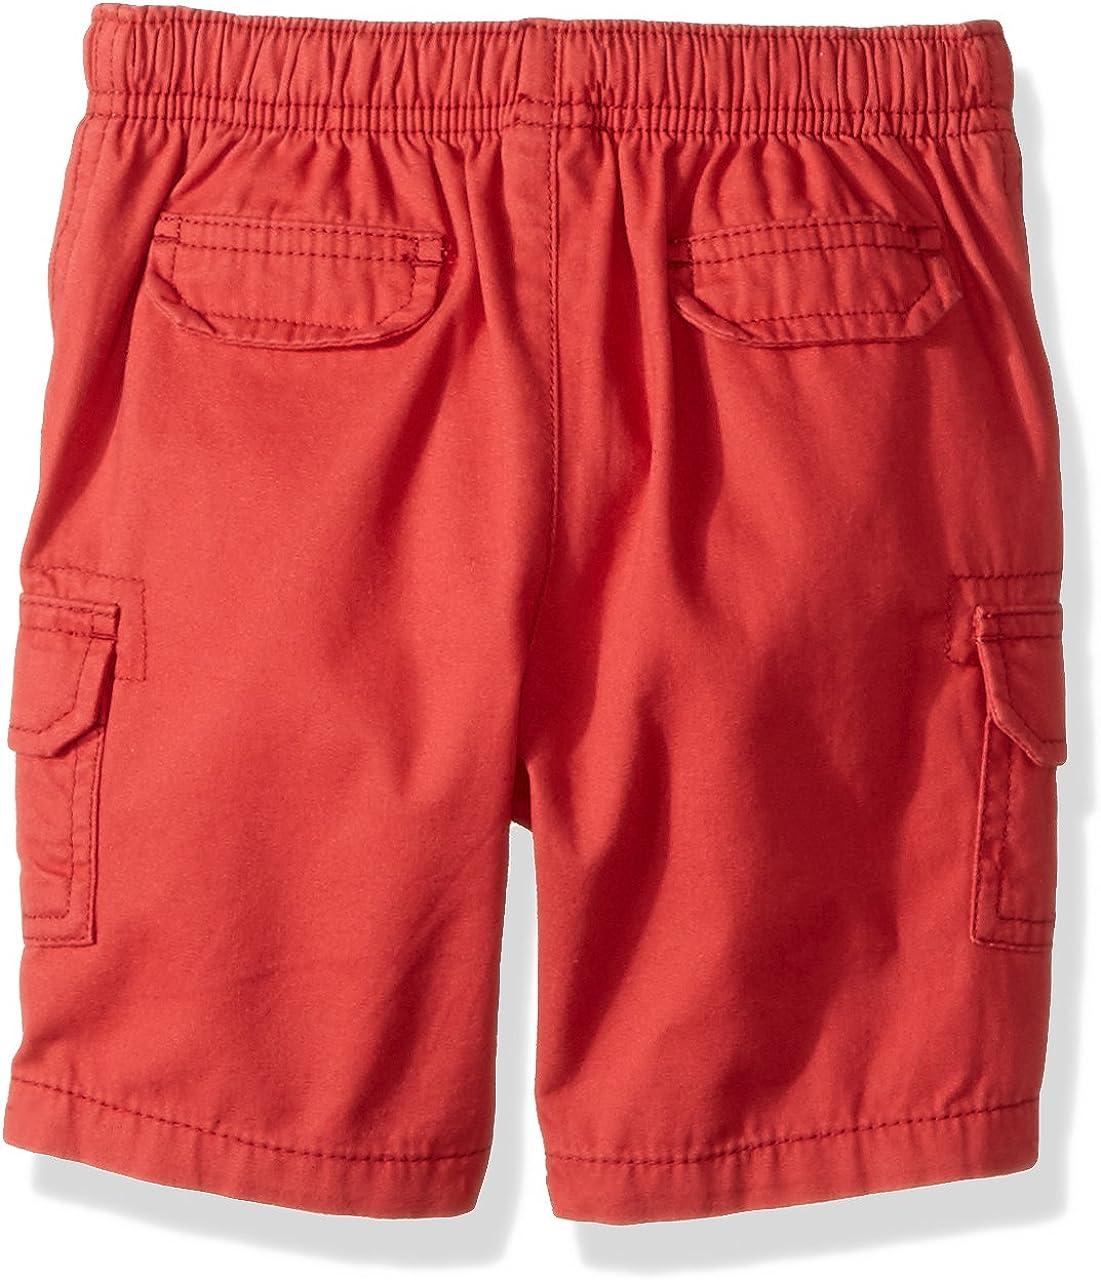 Carters Baby Boys Woven Short 224g354